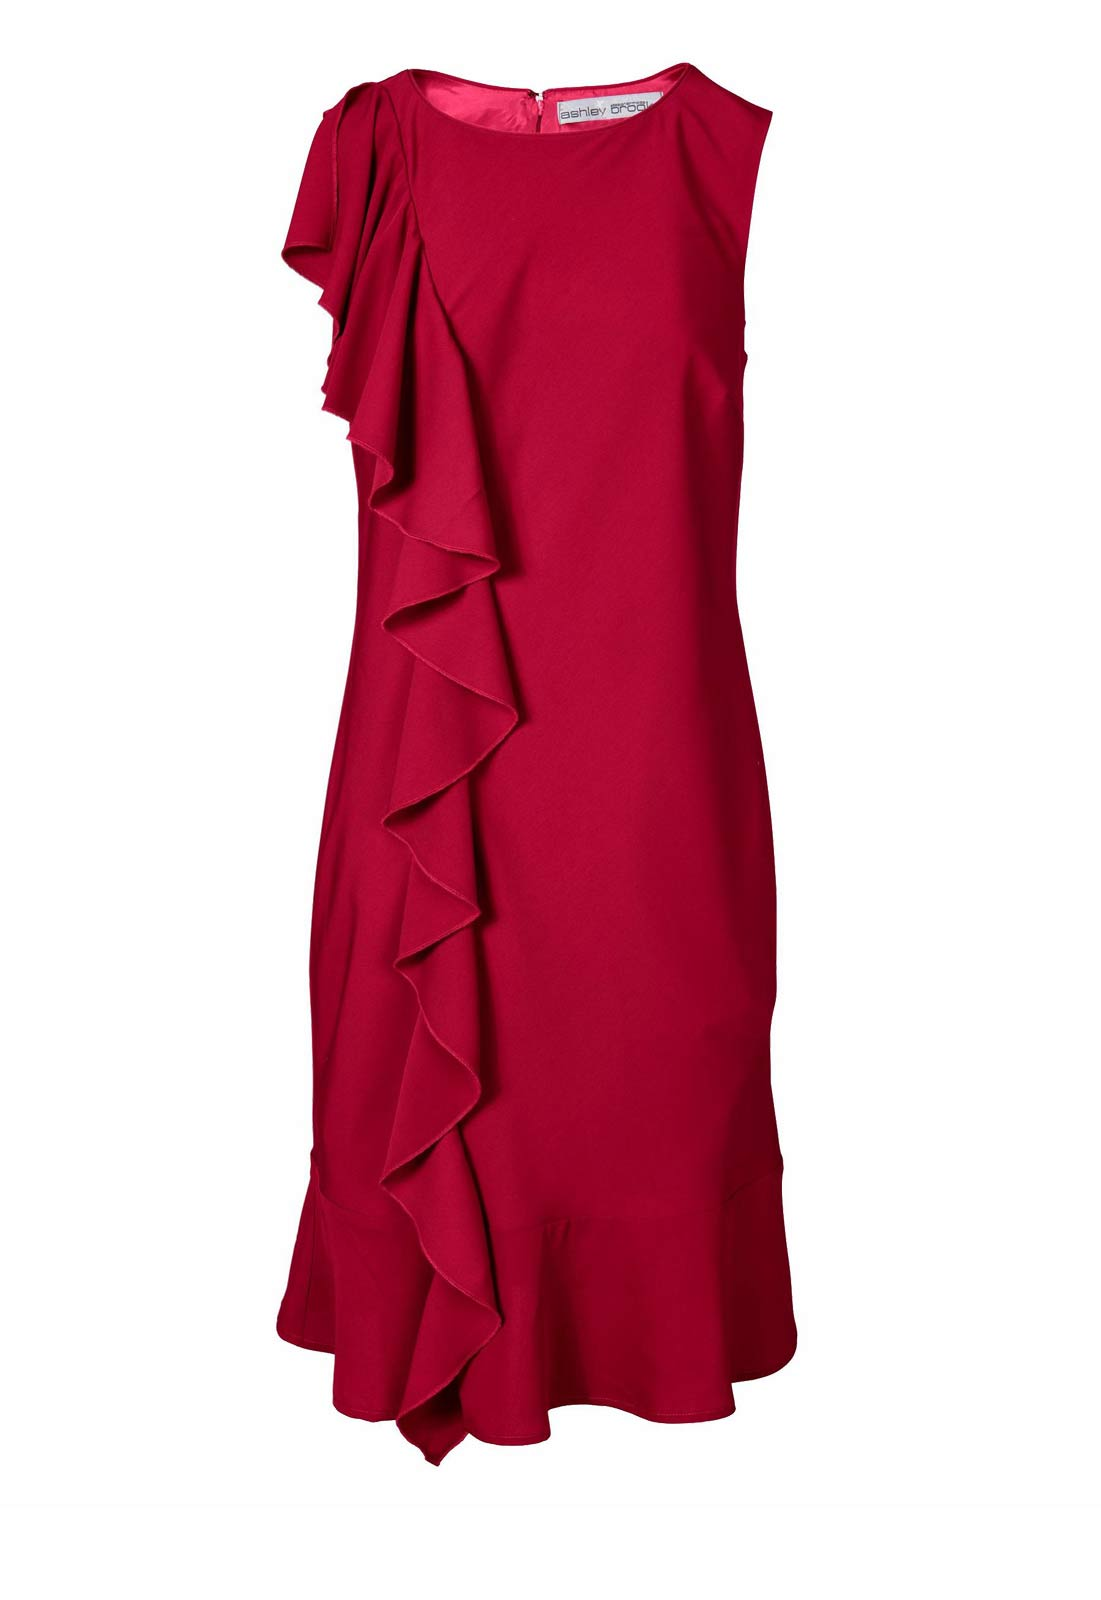 006.981 ASHLEY BROOKE Damen Designer-Volantkleid Rot